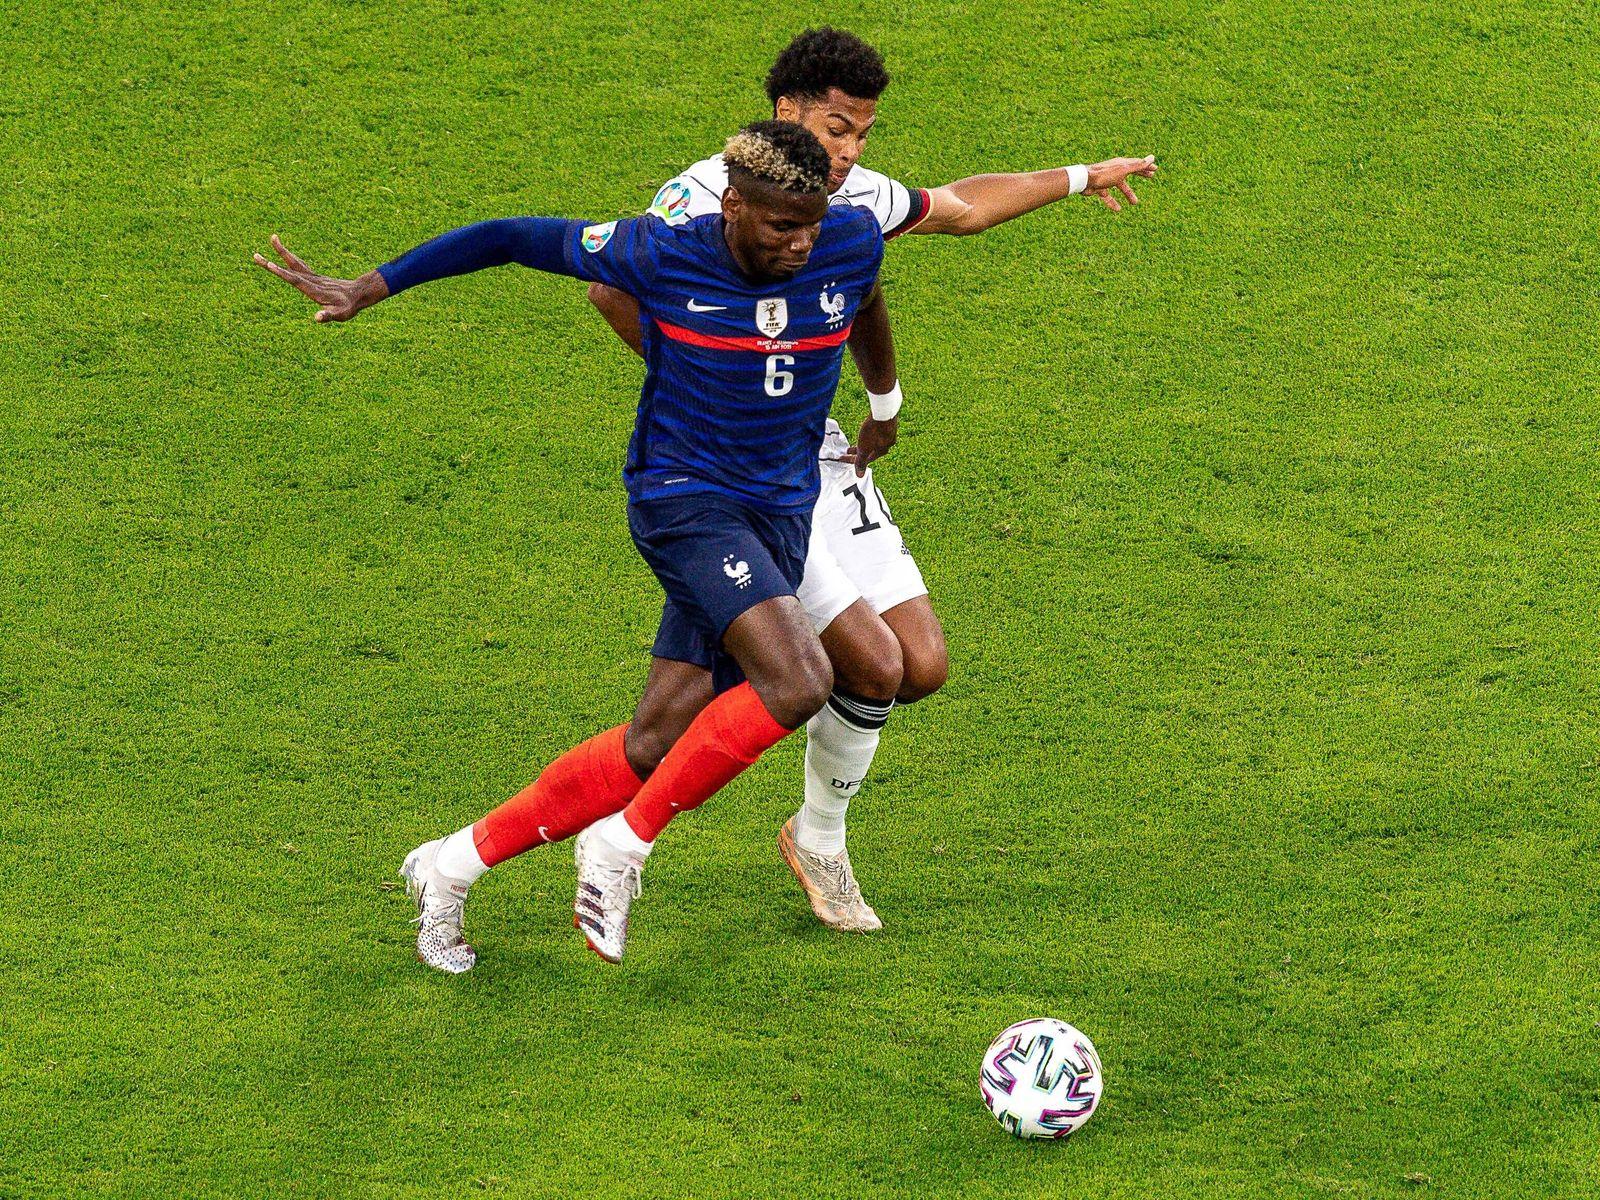 Paul Pogba (Frankreich, 06), Serge Gnabry (Deutschland, 10), GER, Frankreich vs. Deutschland, Fussball, UEFA EURO, EM, E